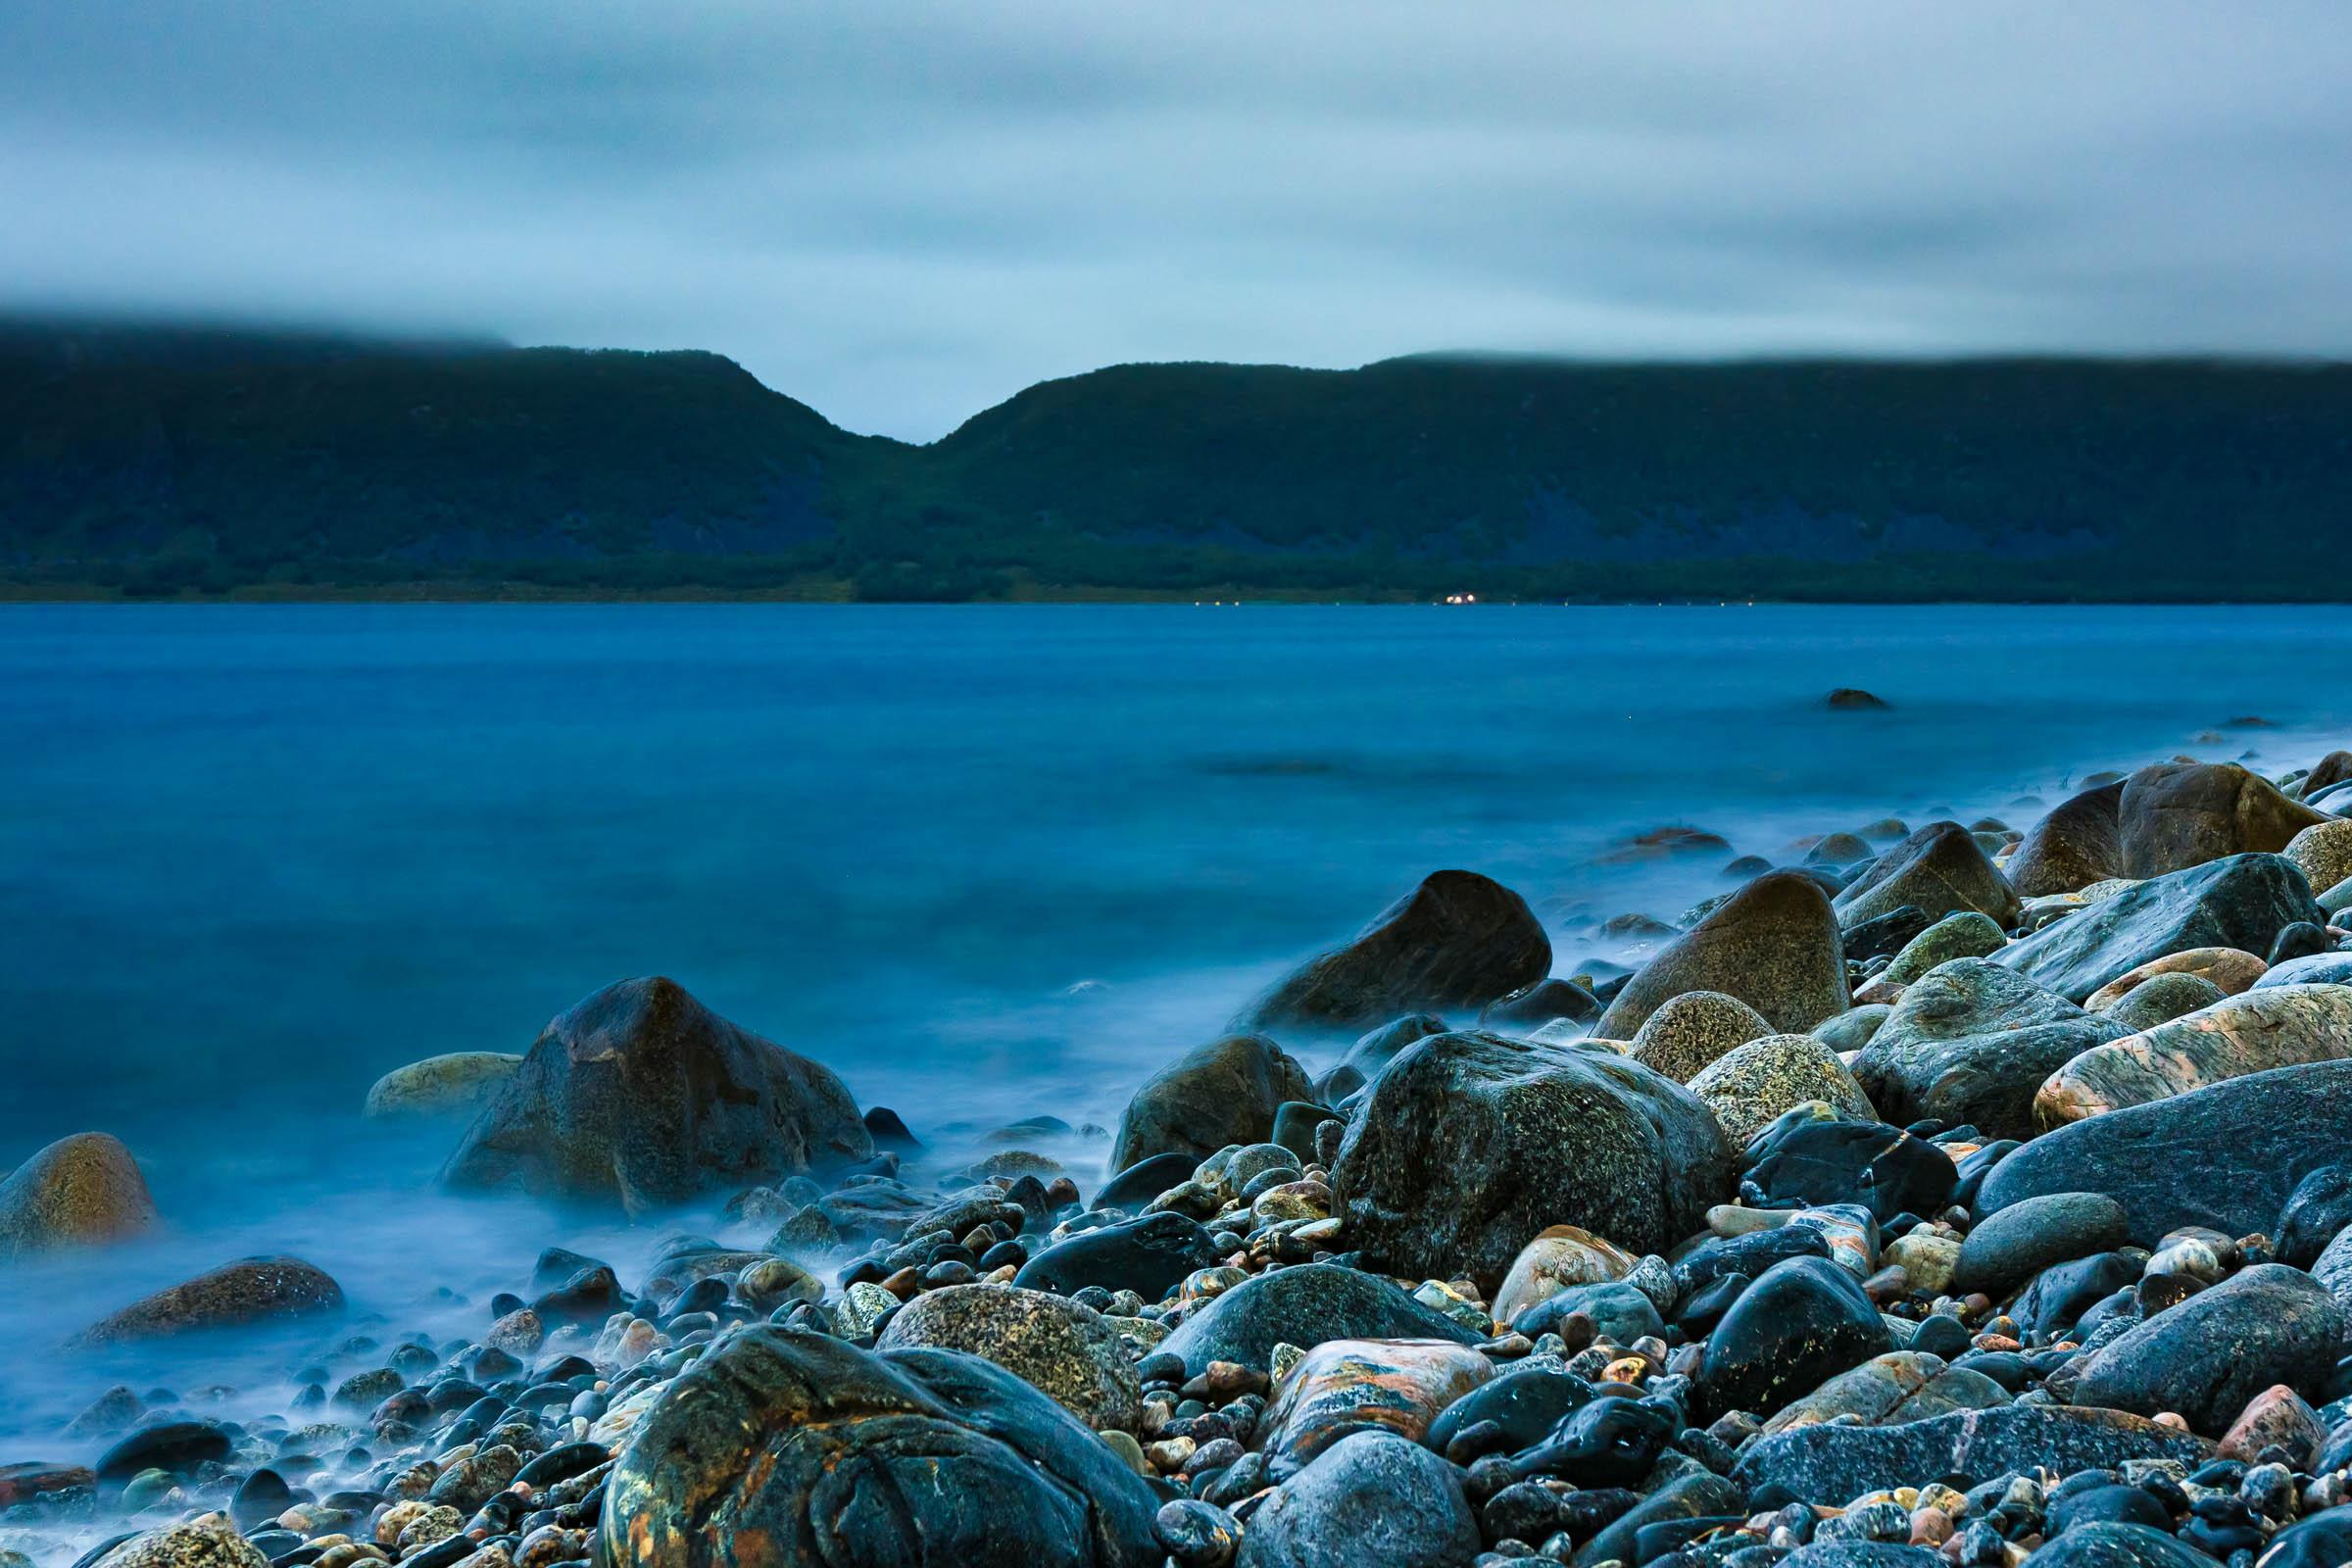 Long exposure - Nupen - Copyright Trygve Selmer